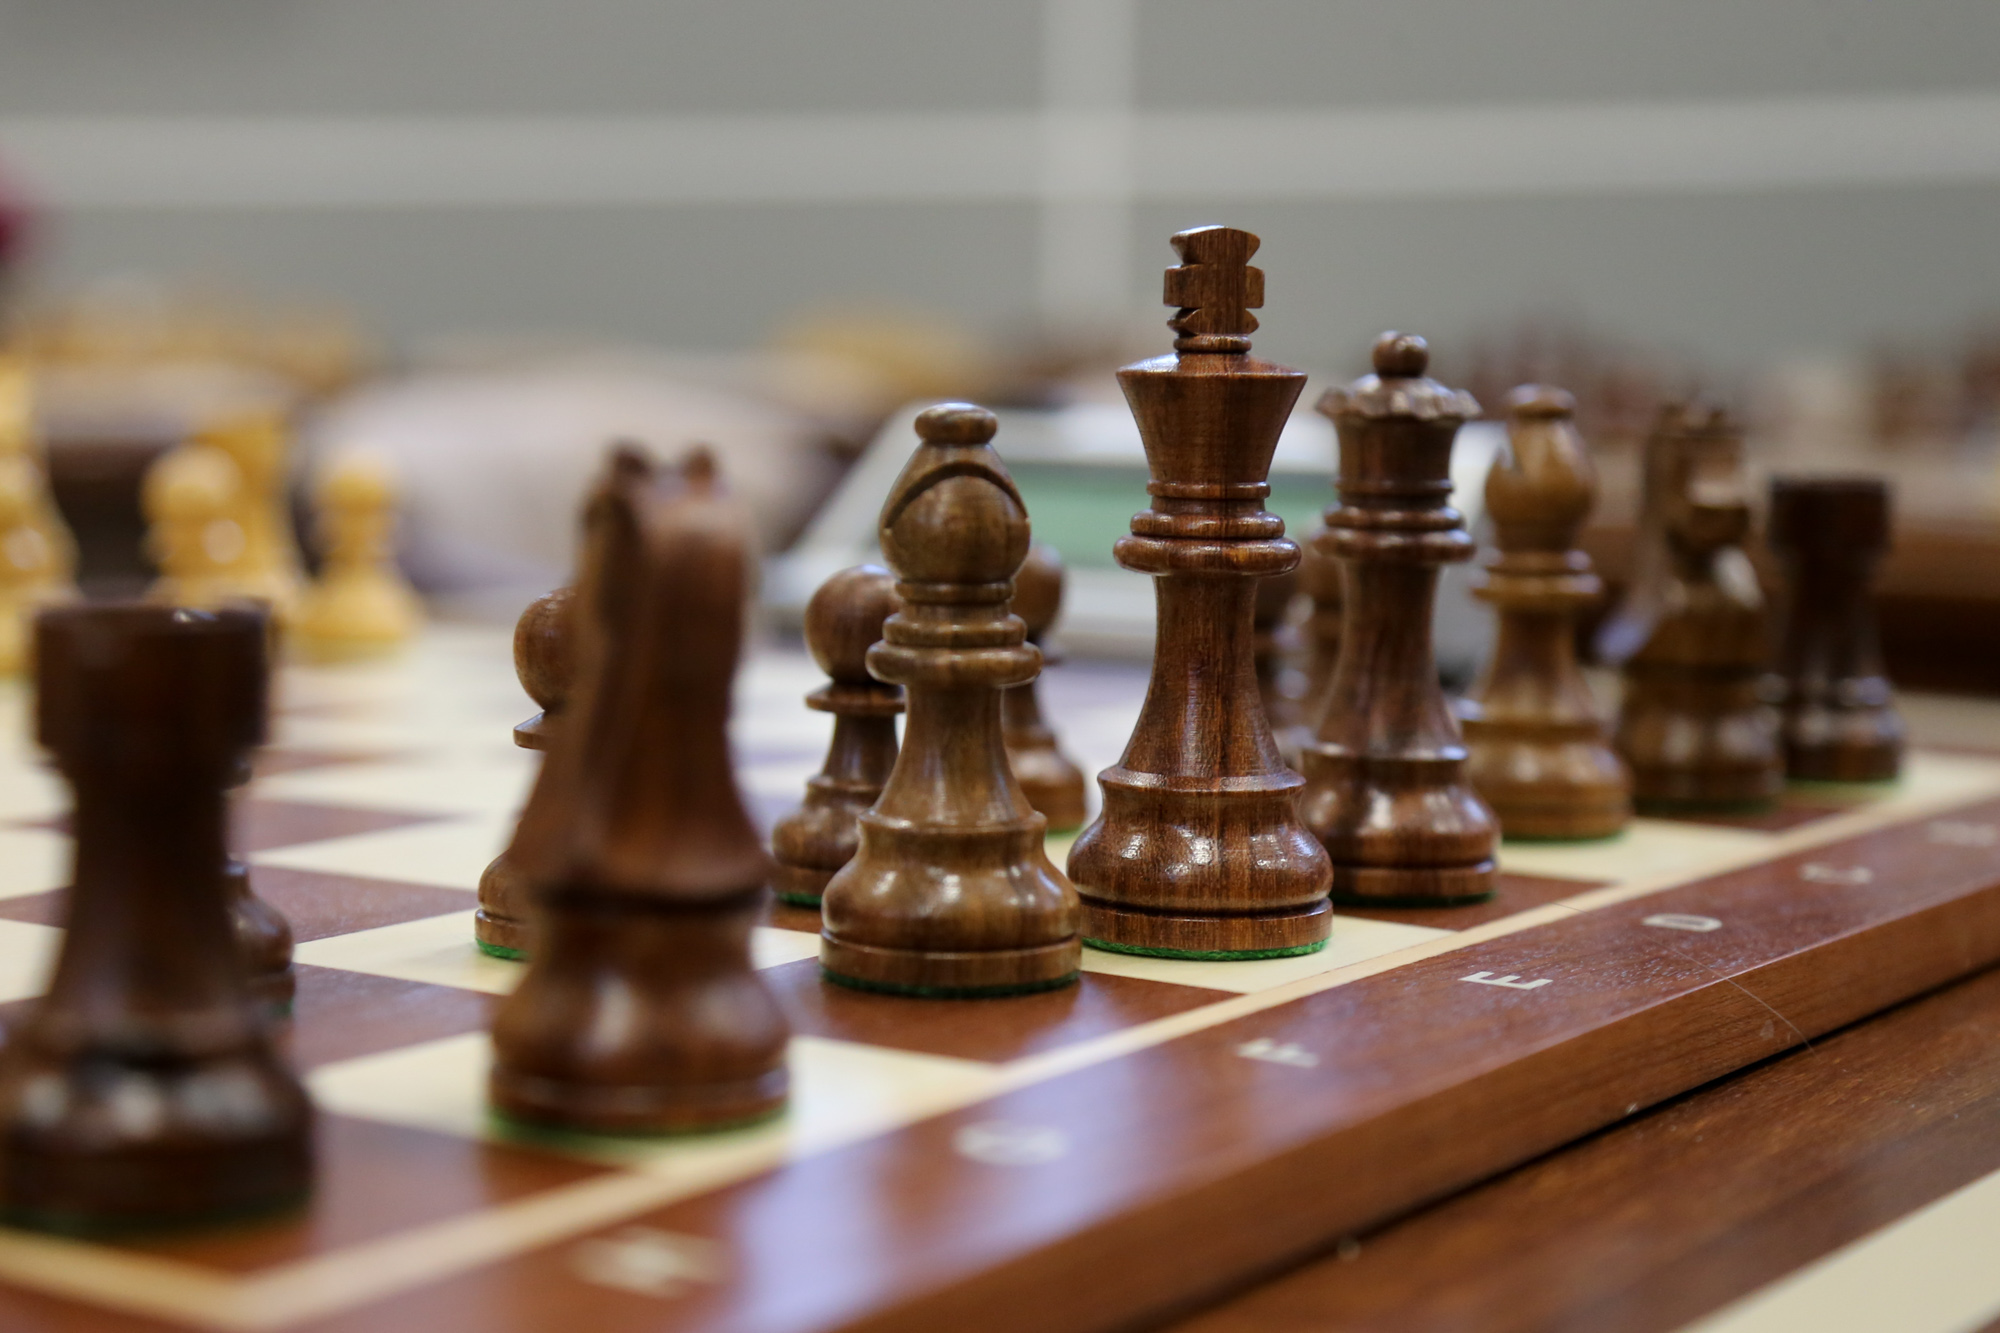 HDoboi.Kiev.ua - Международный день шахмат фото